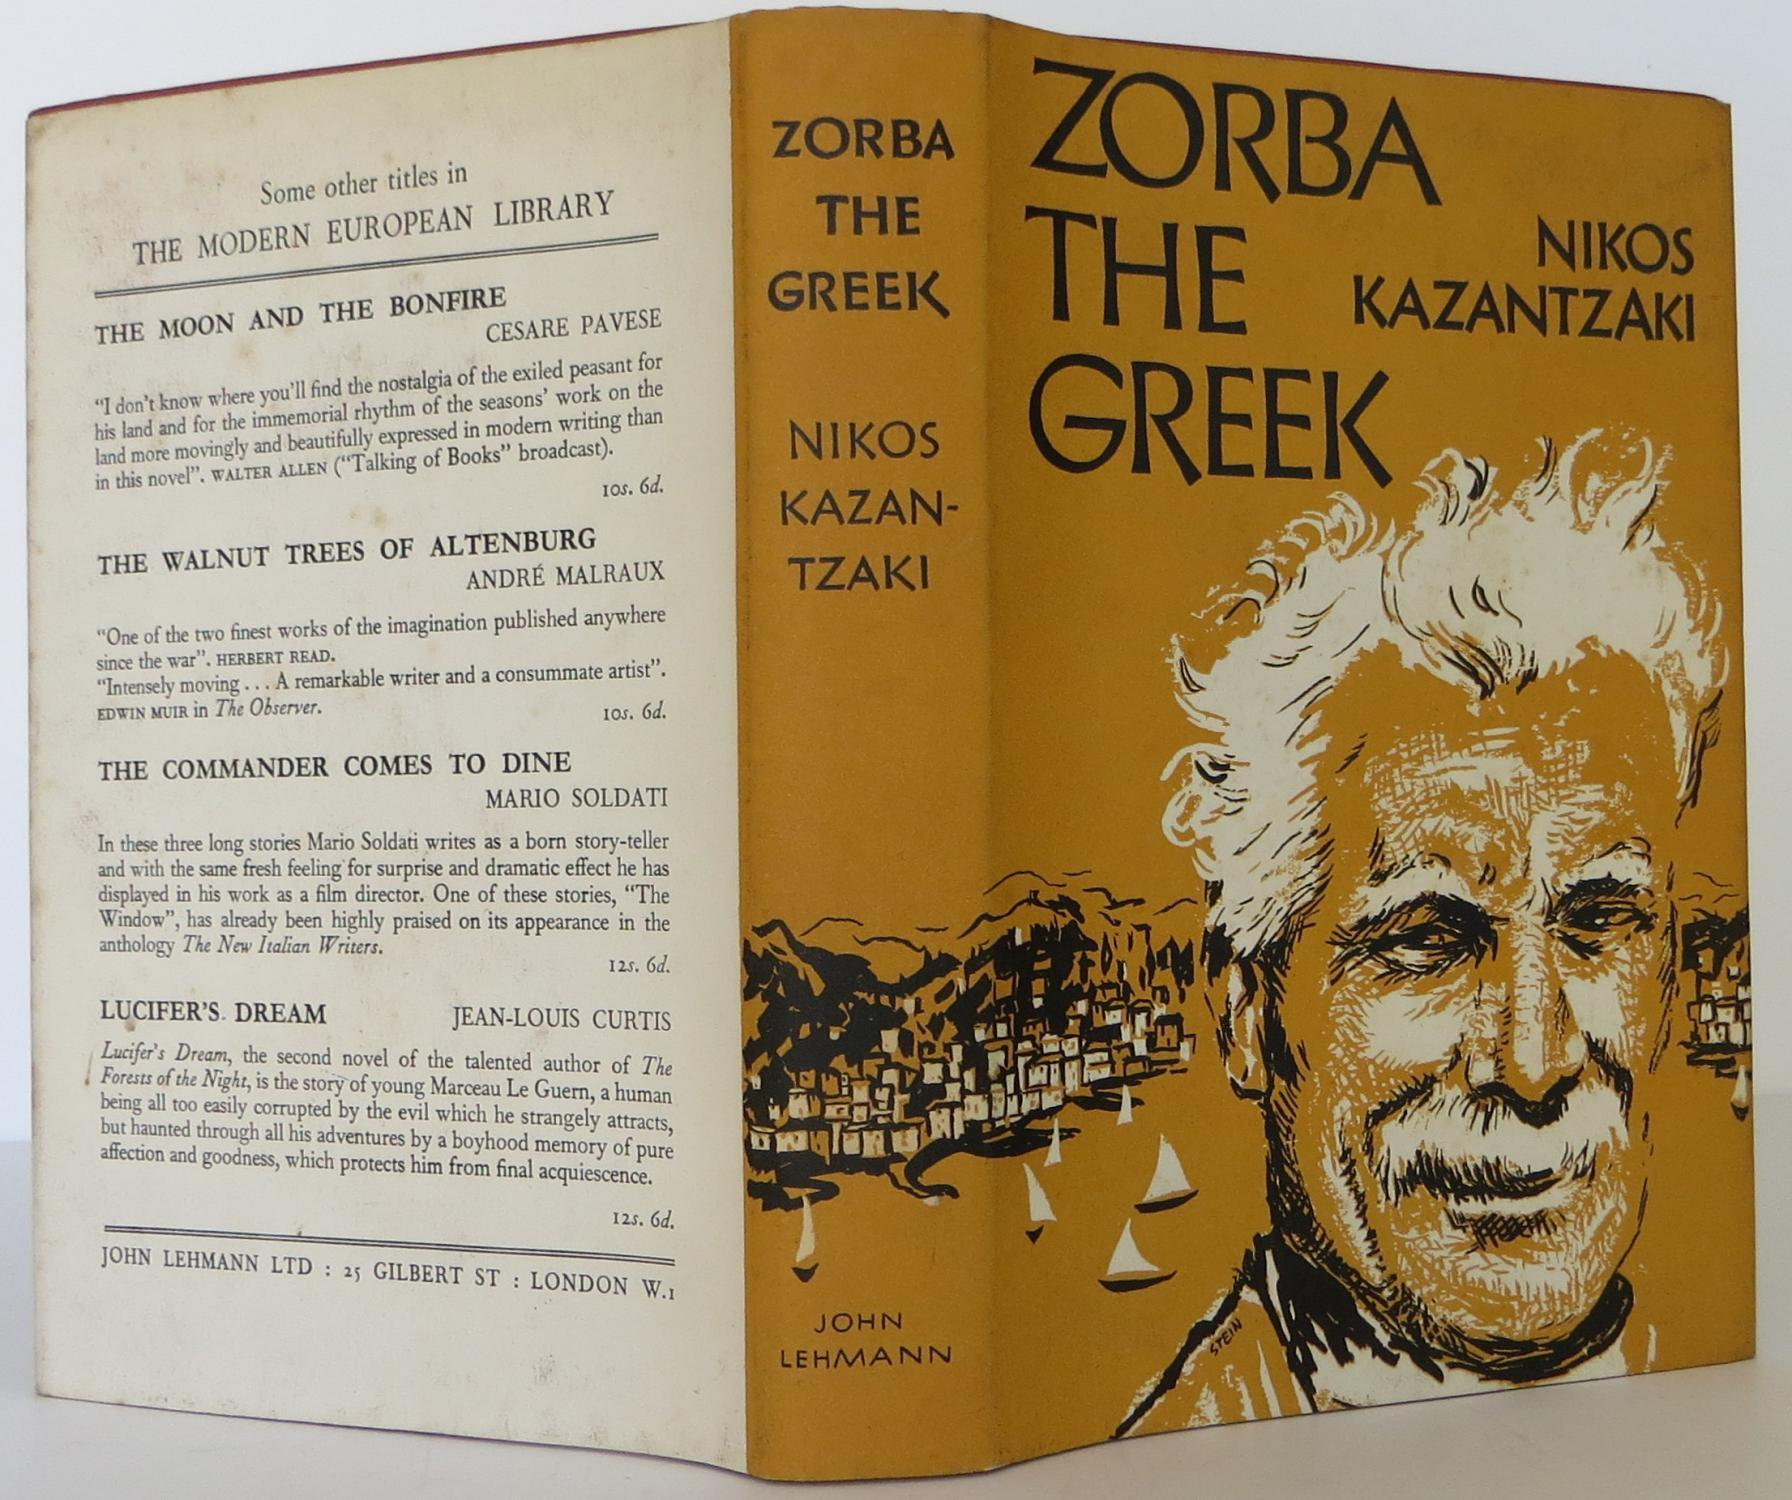 Zorba the Greek Kazantzaki, Nikos